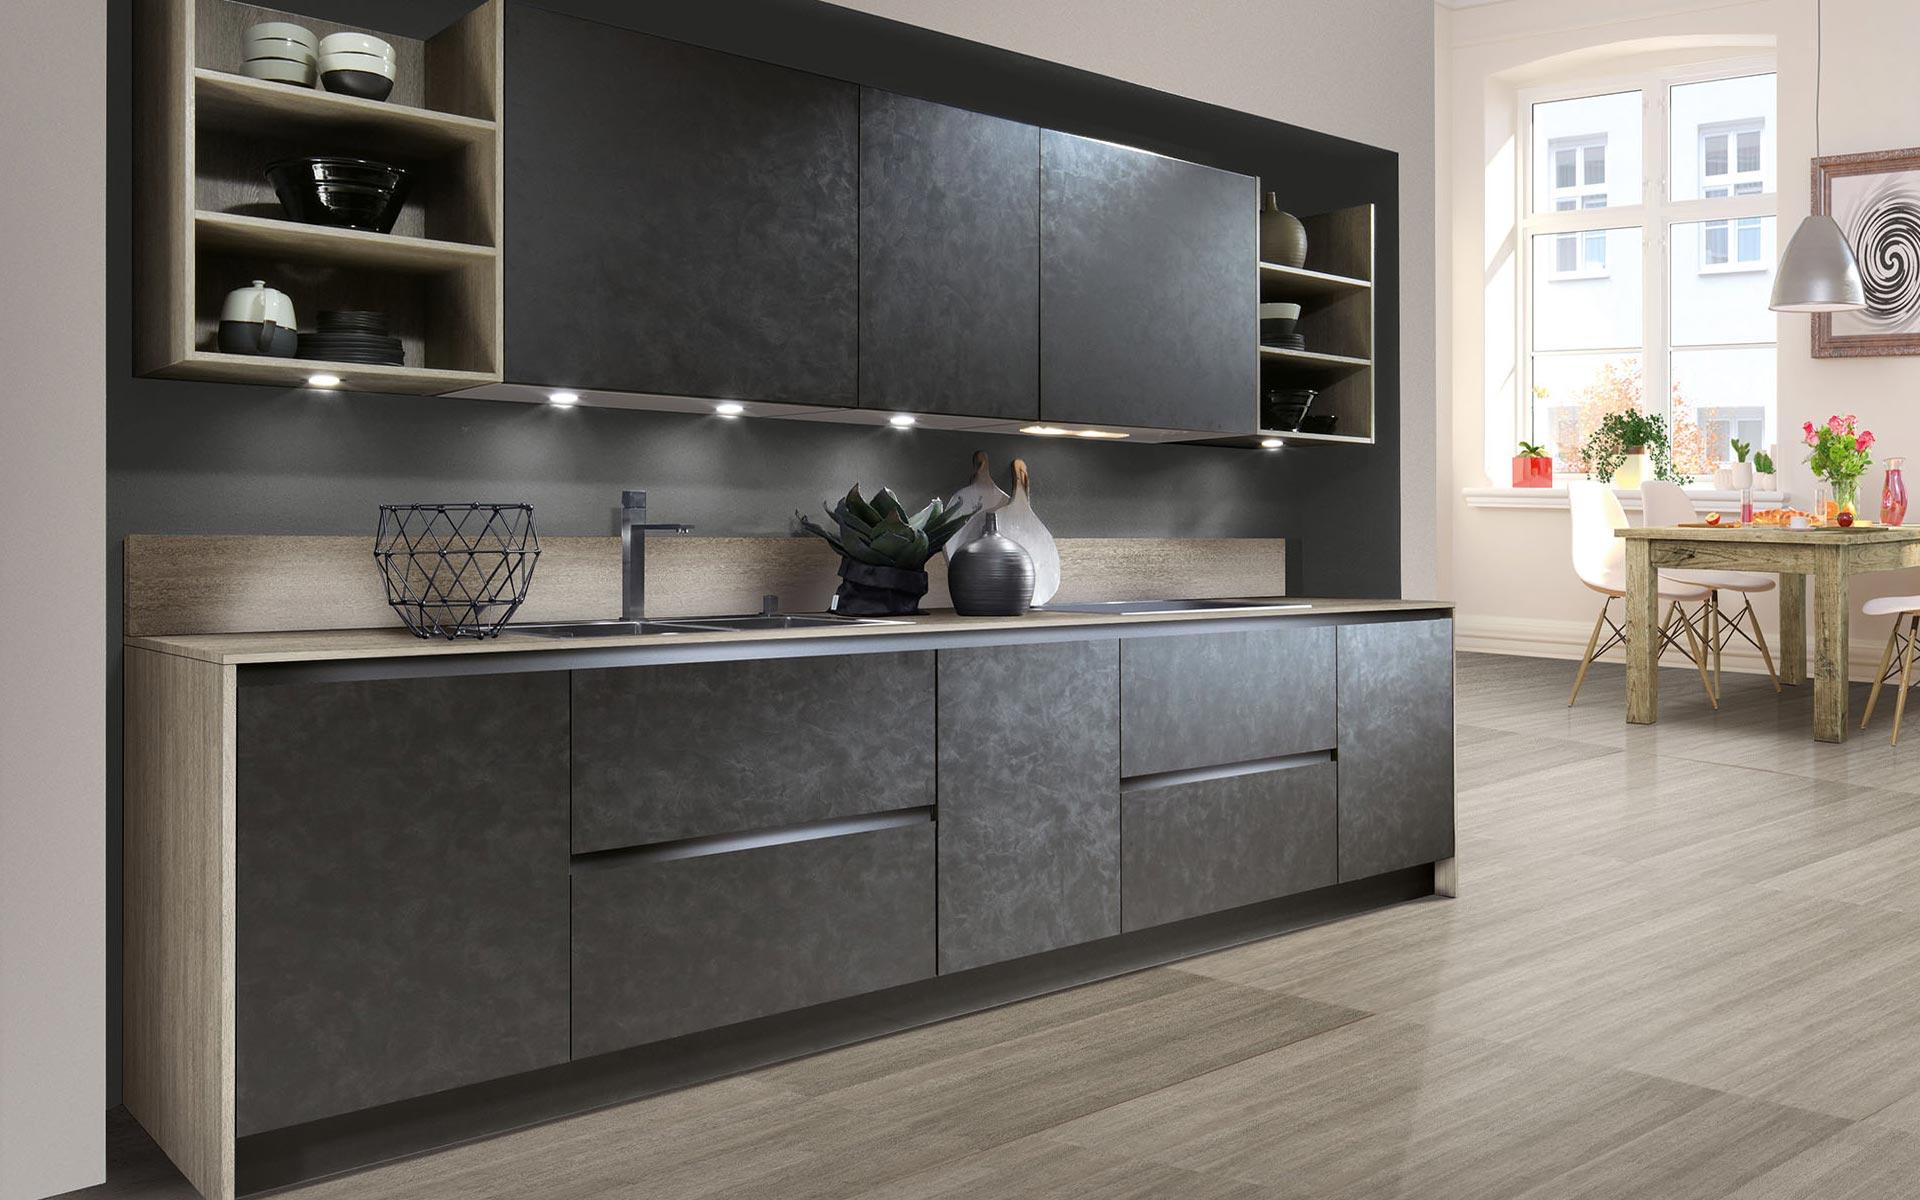 Toronto: Kitchens from Germany, Europe. Cemento Basalt Dunkel